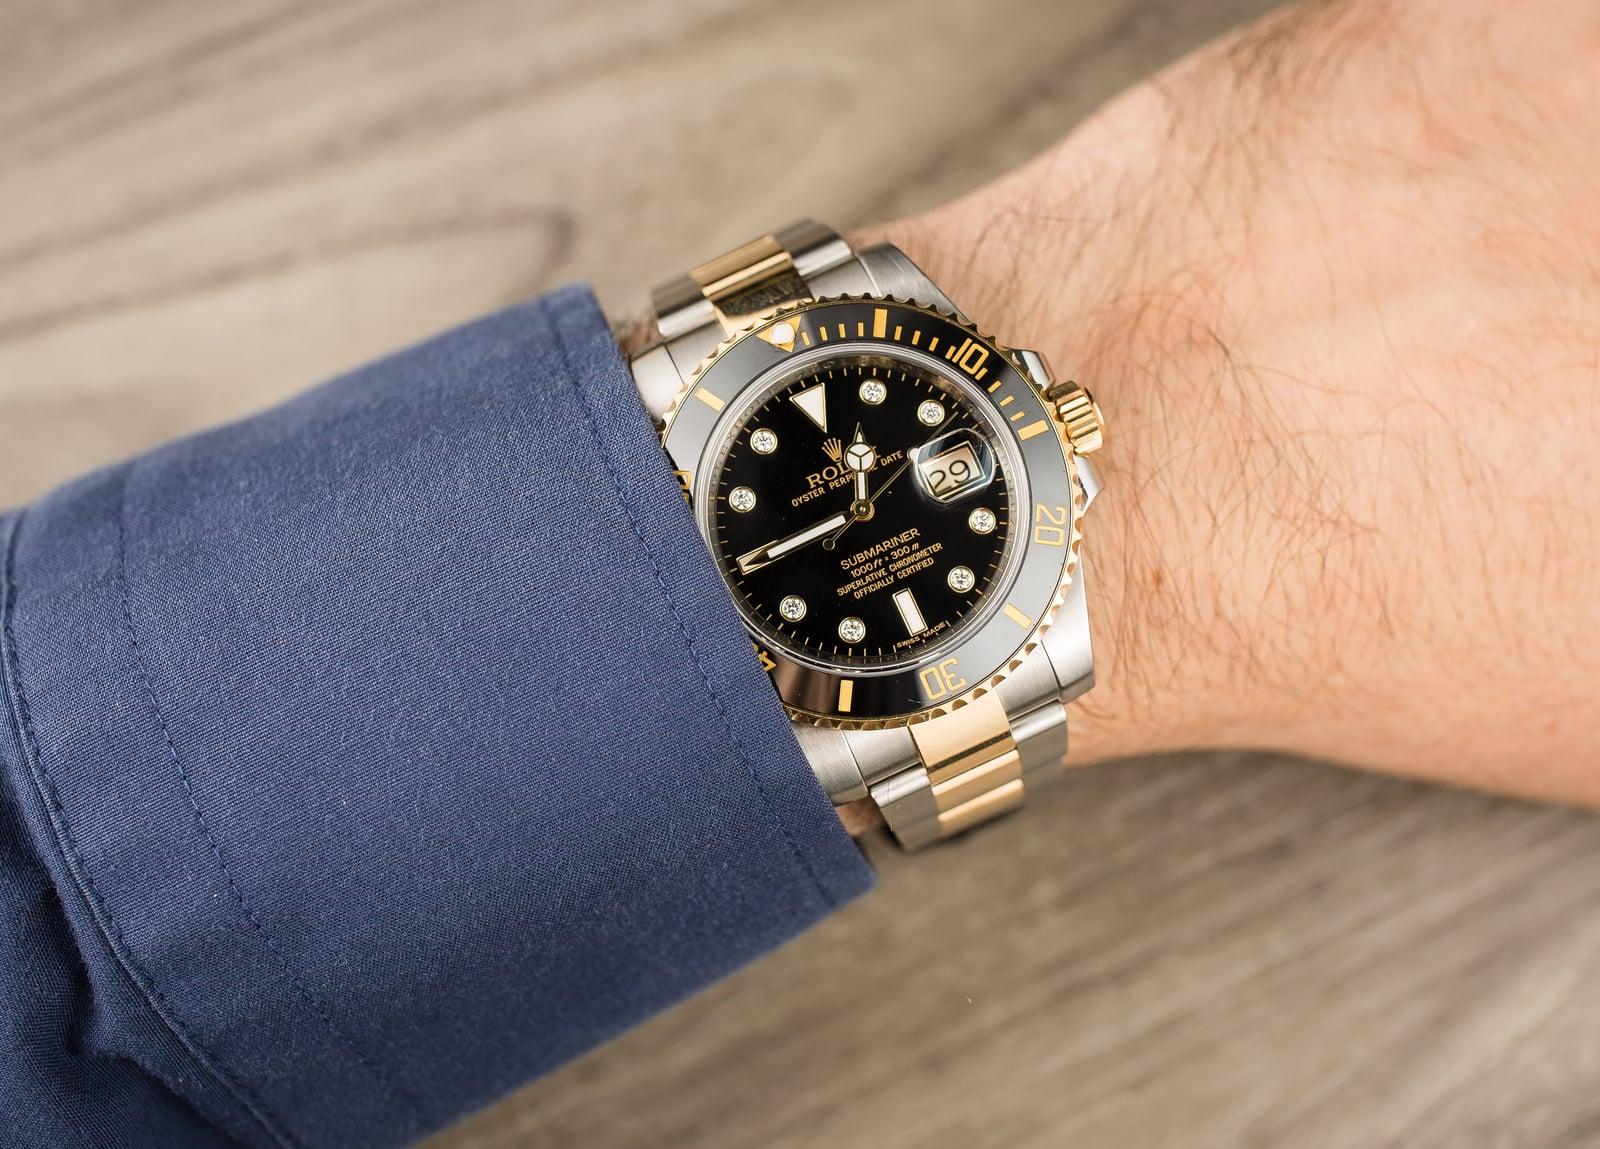 Rolex Diamond Submariner 116613 Two Tone